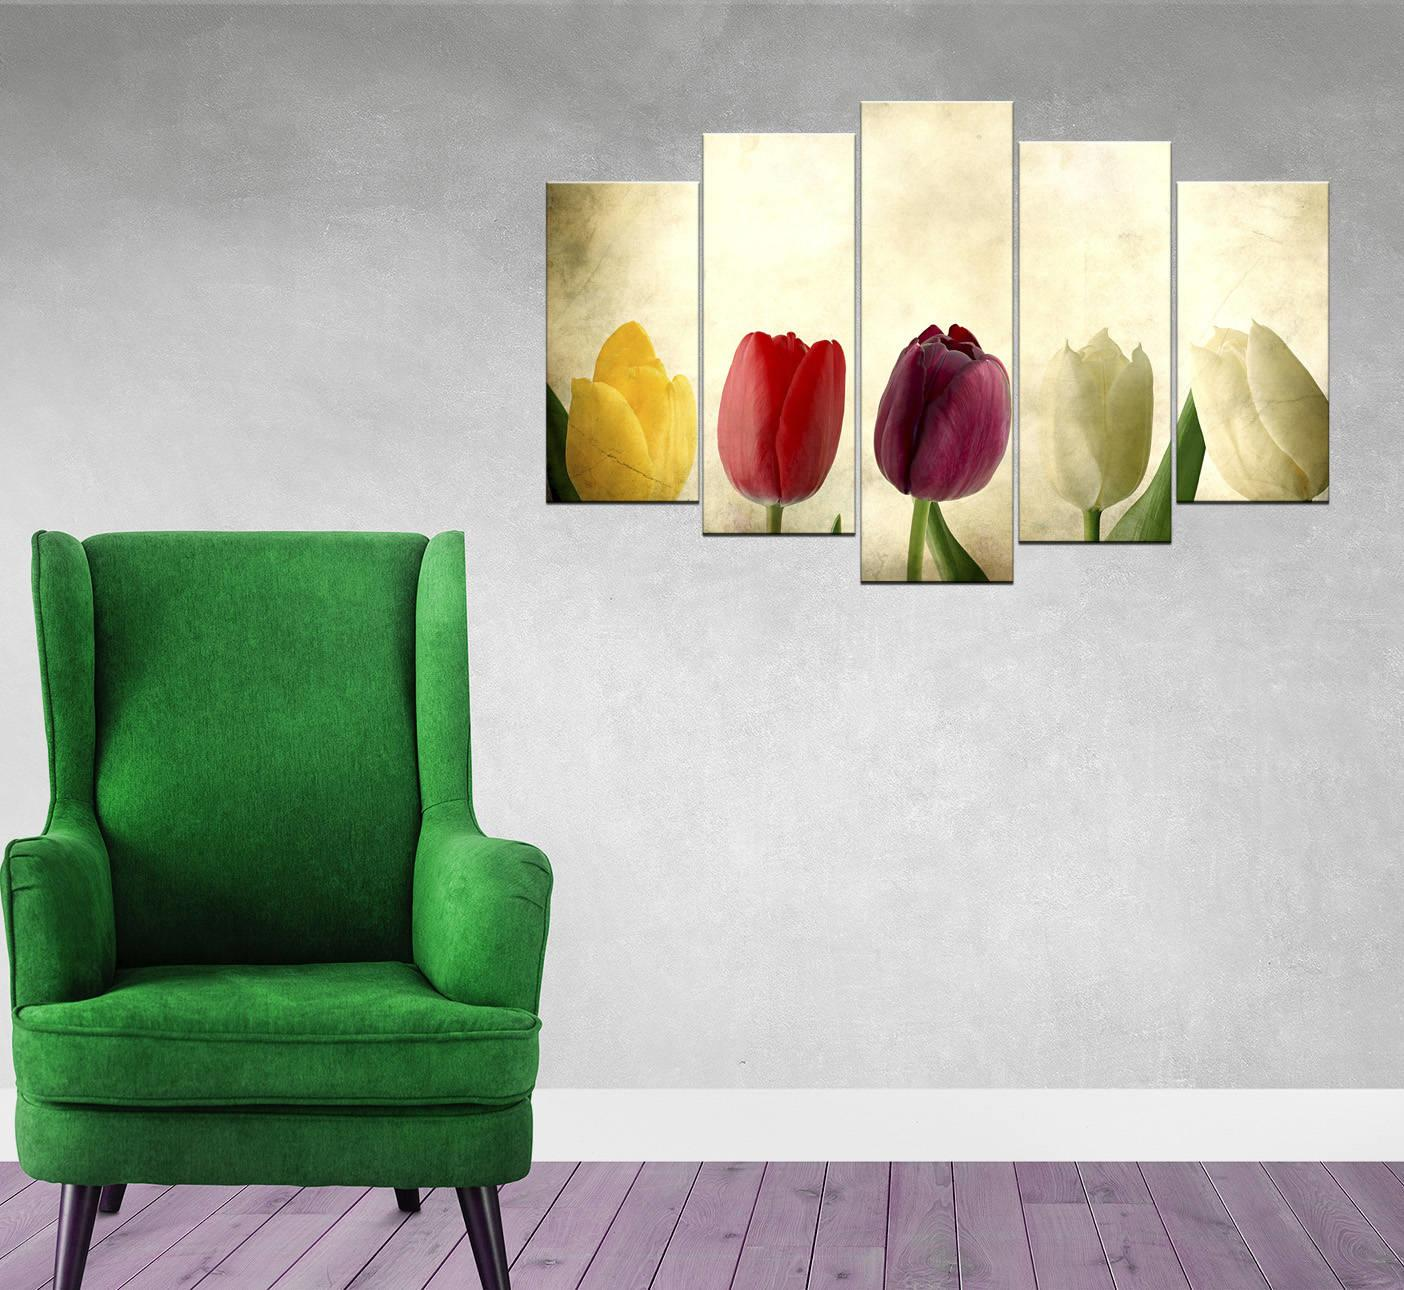 Renkli Lale 5 Parçalı Mdf Tablo-3602